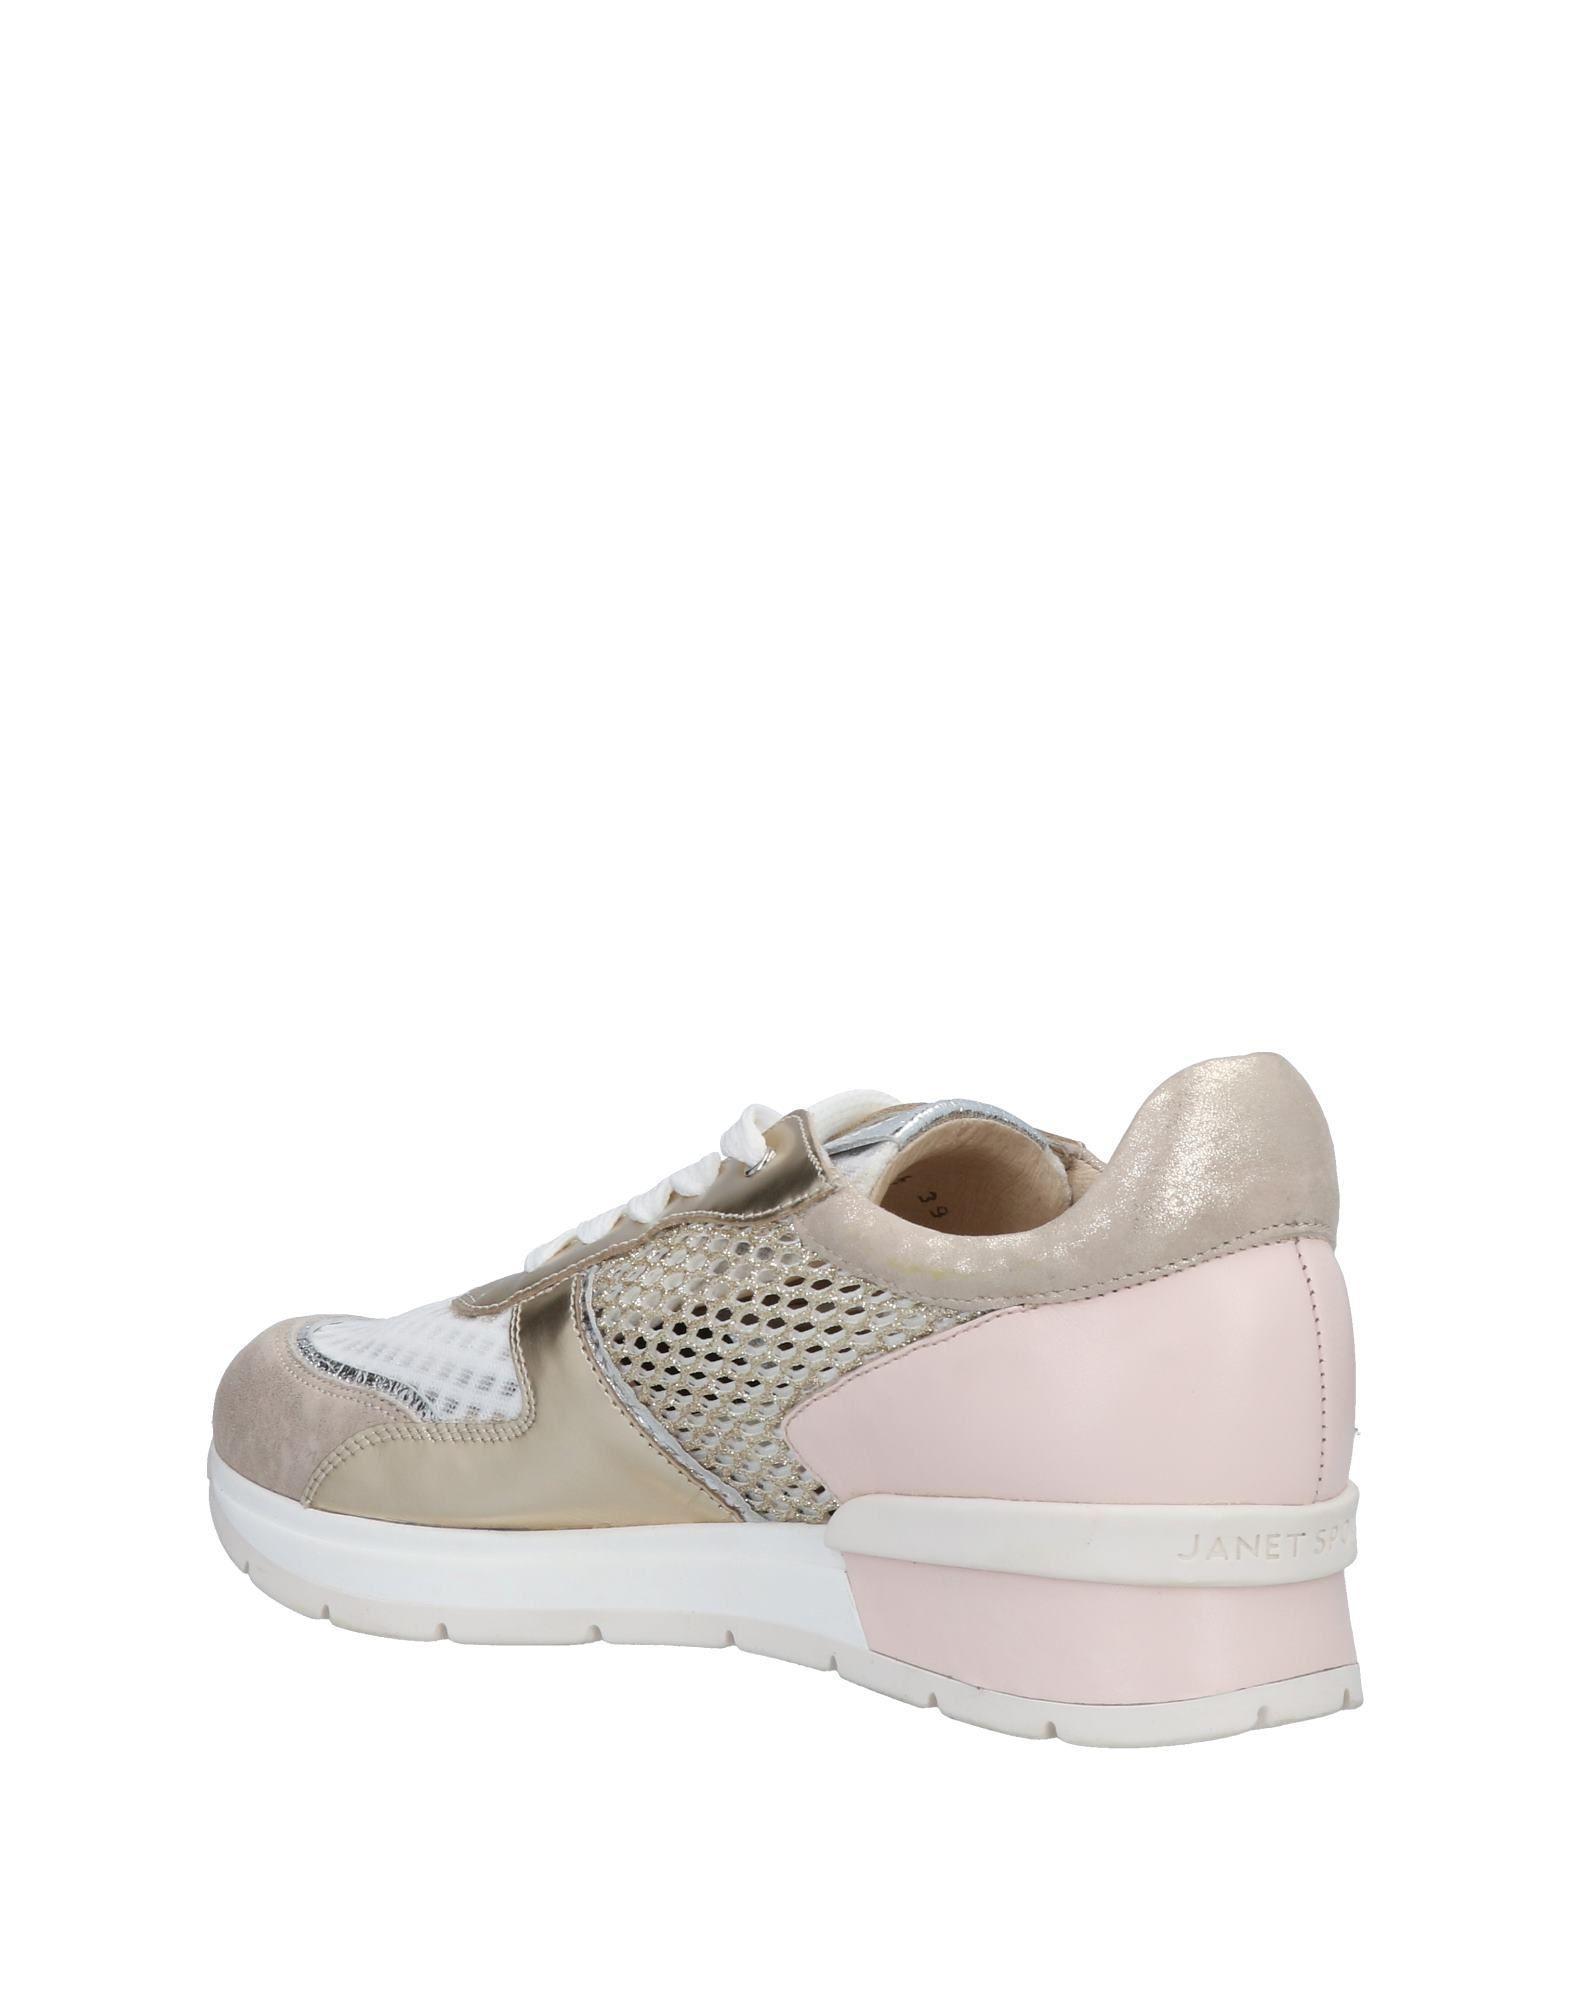 Janet & Janet Suede Low-tops & Sneakers